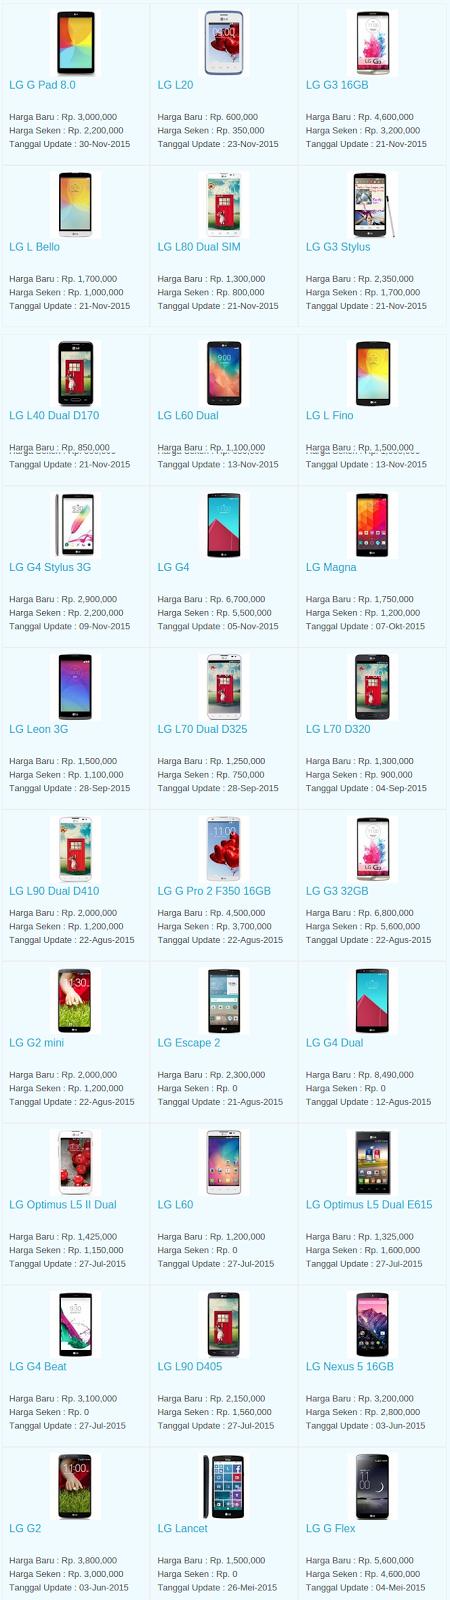 Daftar Harga Hp LG Desember 2015